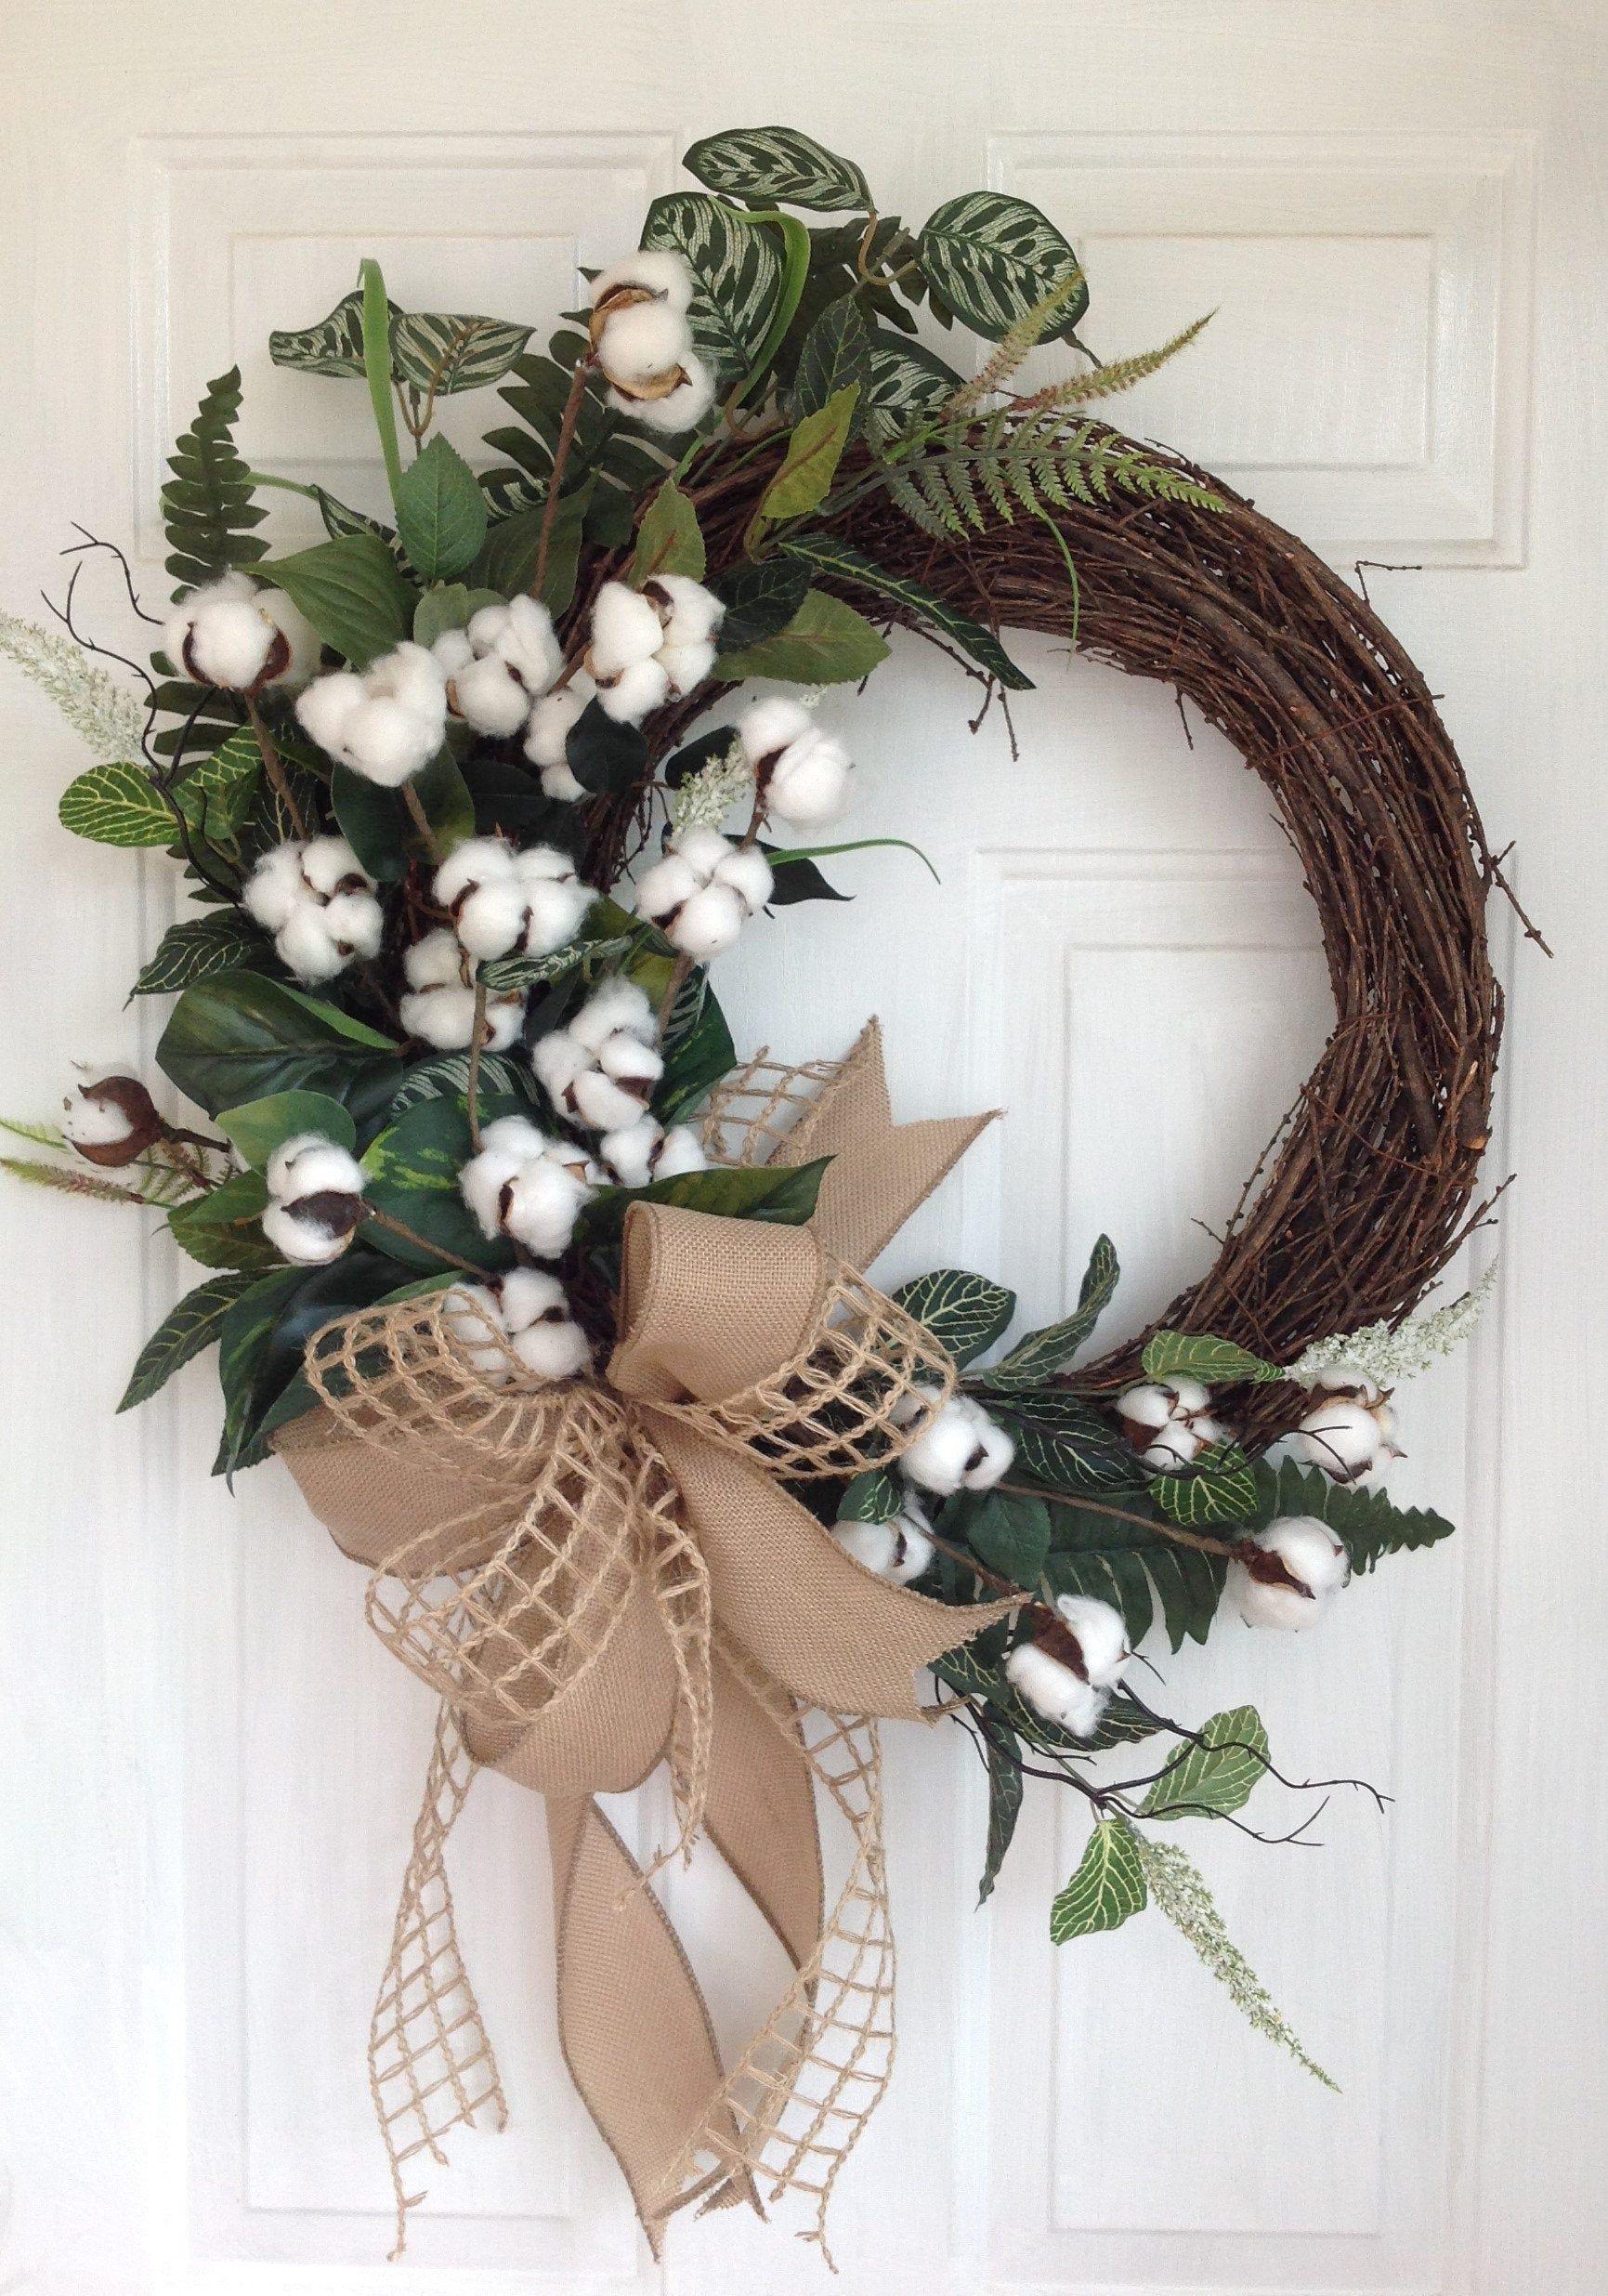 Cotton Wreath Front Door Wreath Farmhouse Wreath Year Round Wreath Everyday Wreath Cotton Burlap Wreath W Door Wreaths Diy Wreath Decor Diy Spring Wreath